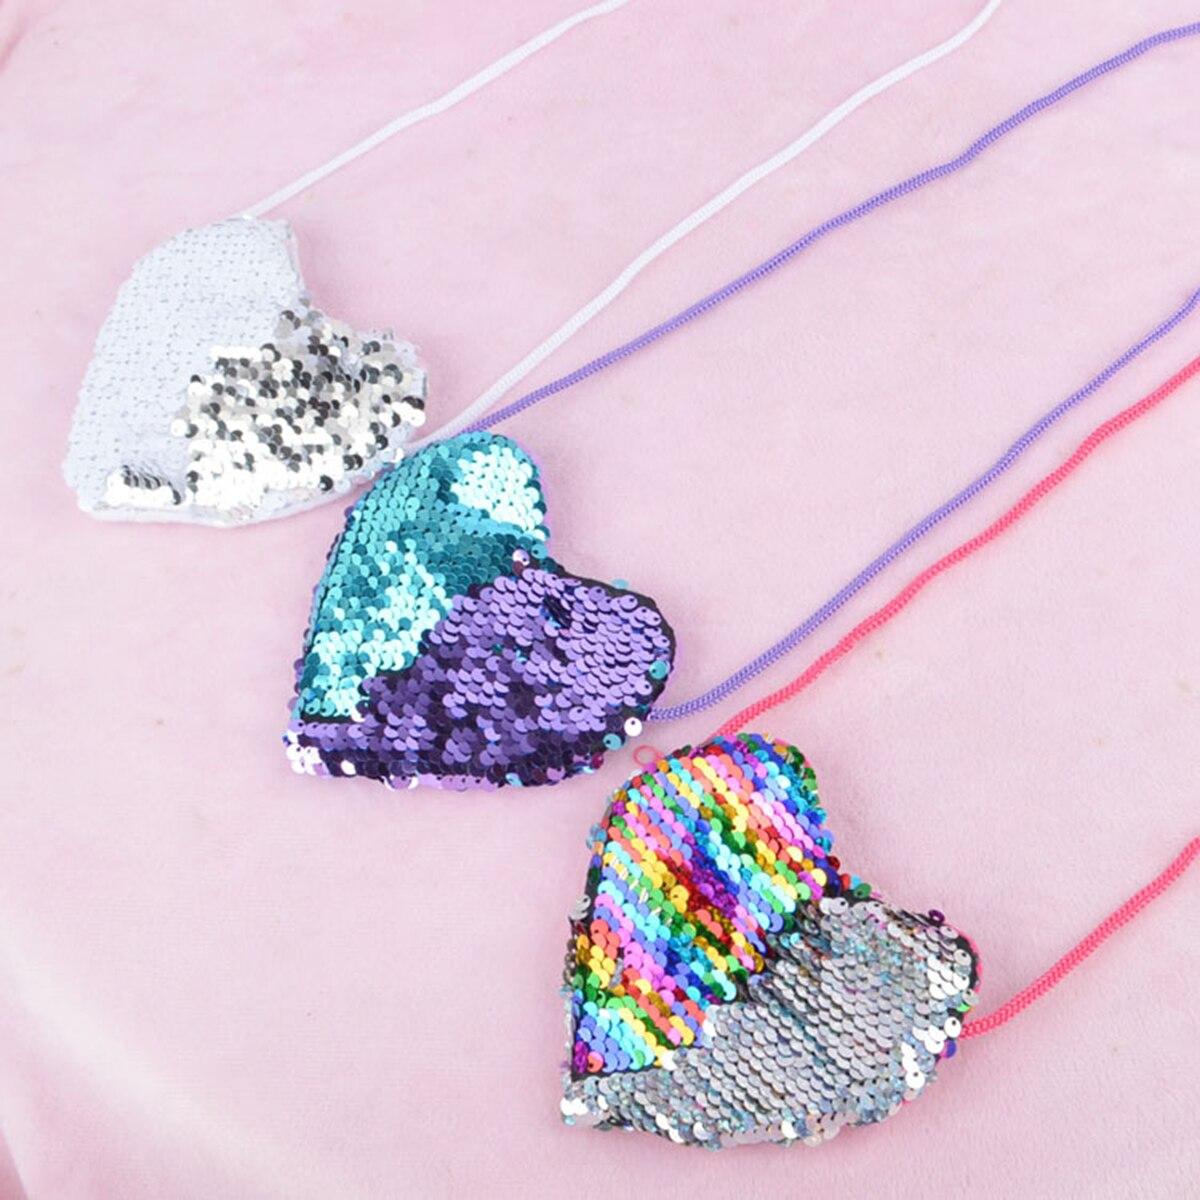 2019 Girl Sequins Small Shoulder Coin Bag Mini Children Coin Money Card Key Holder Wallet Purse Pouch Handbags Kids Gifts